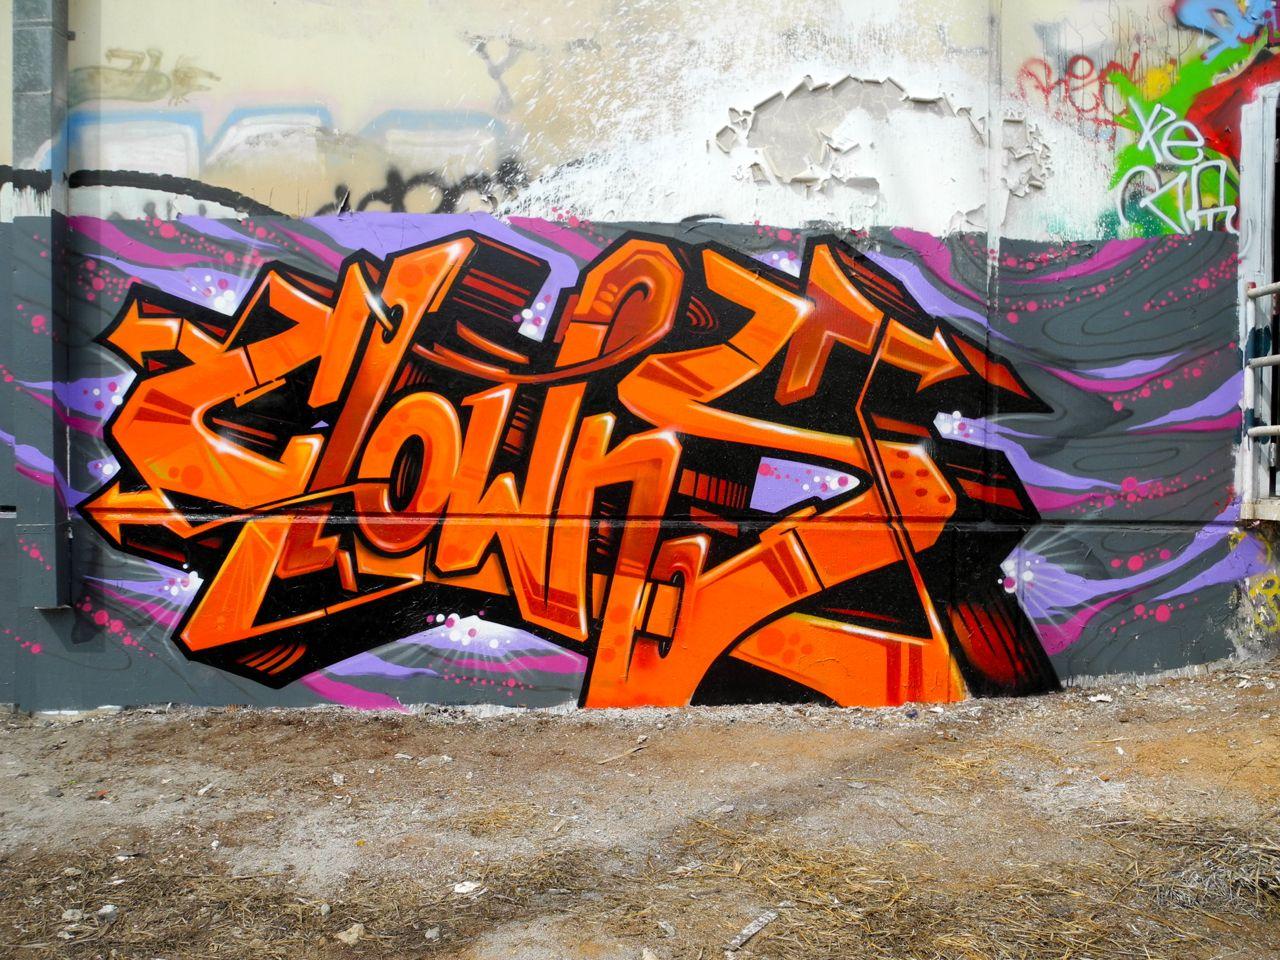 Interview: Clown TITS